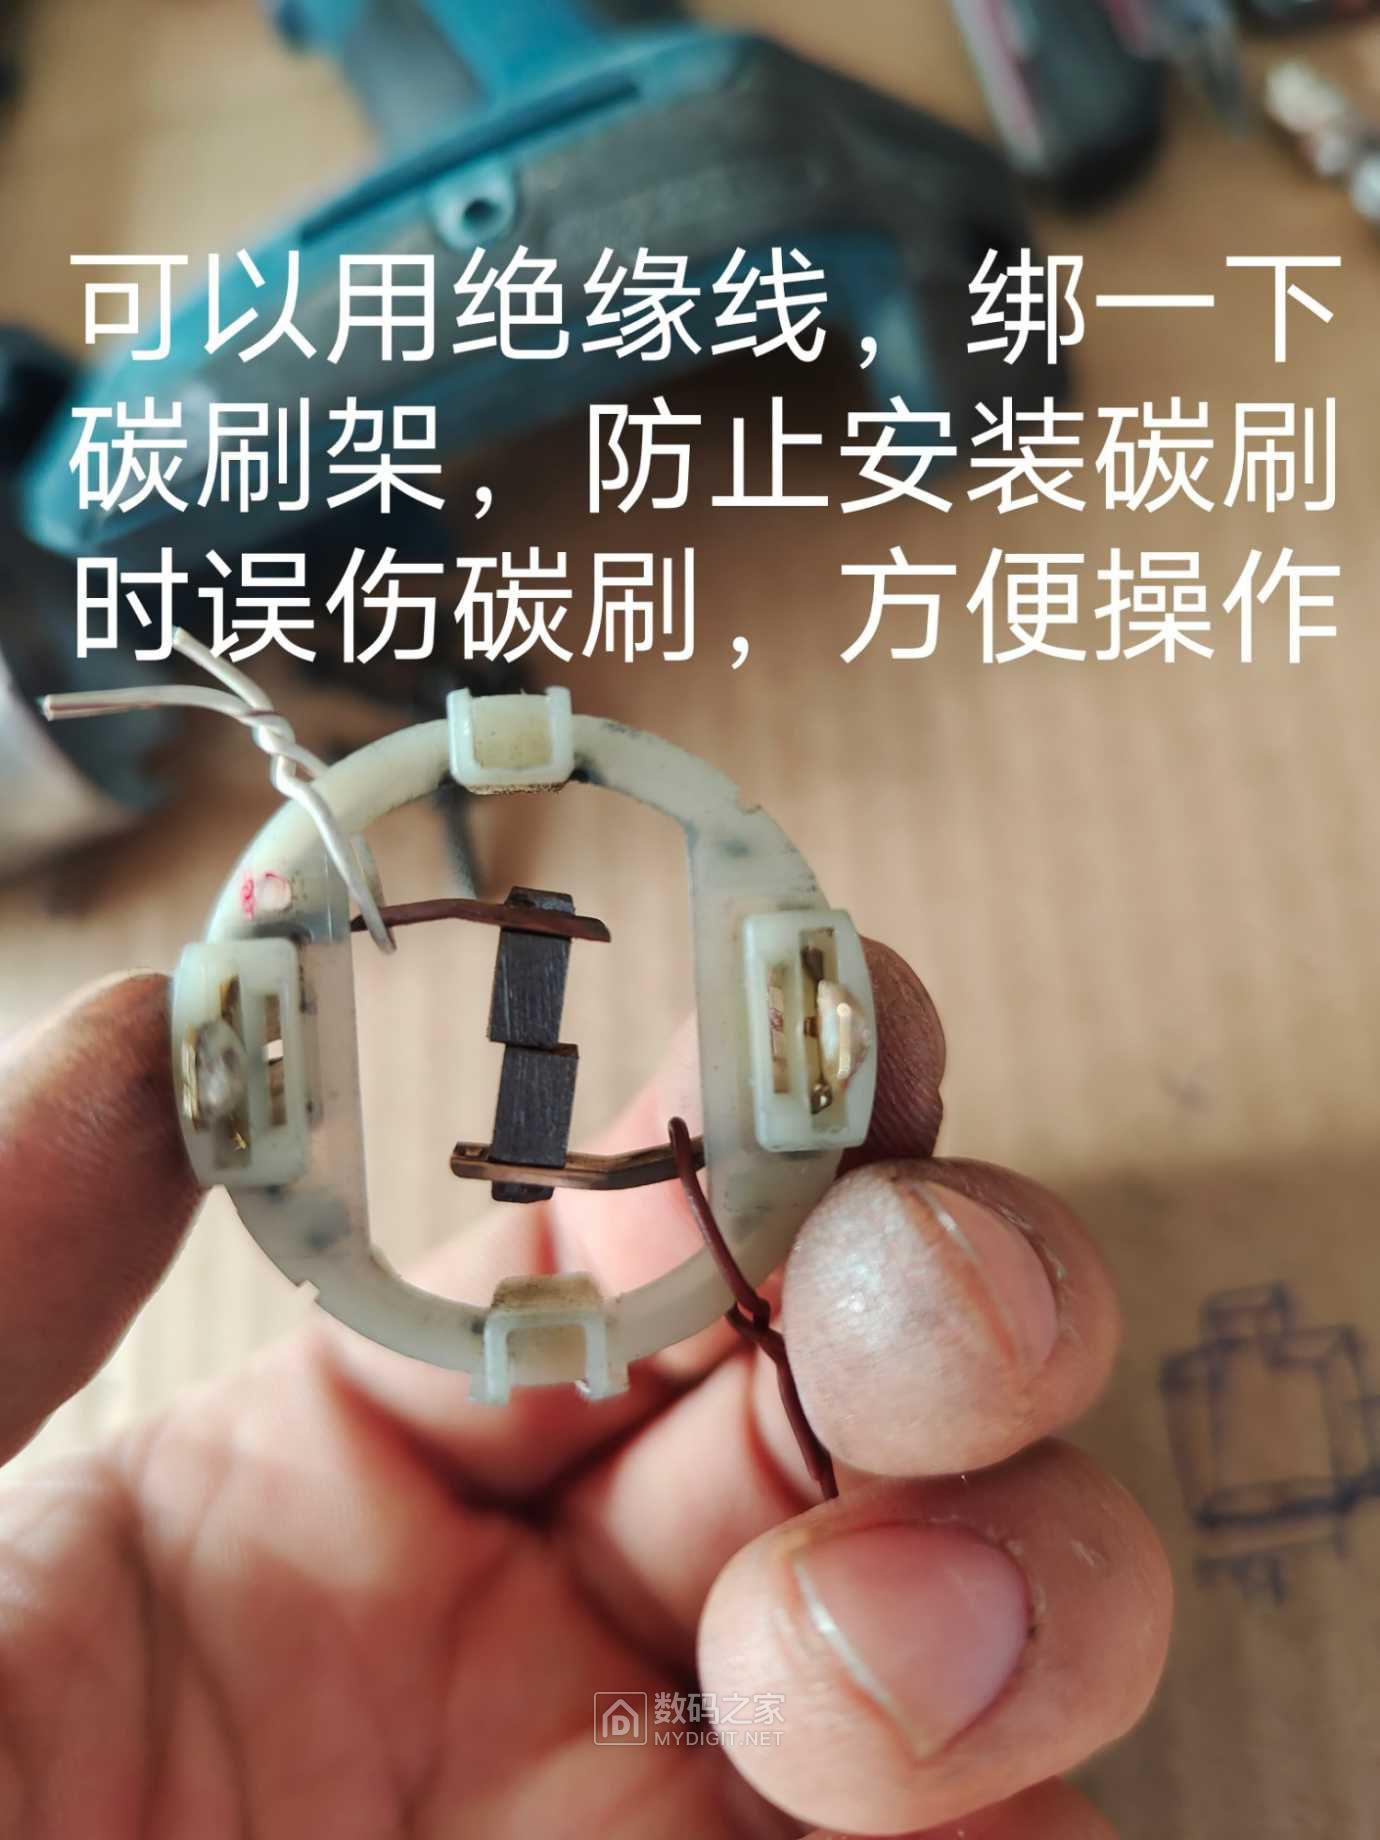 IMG_20201201_163030.jpg